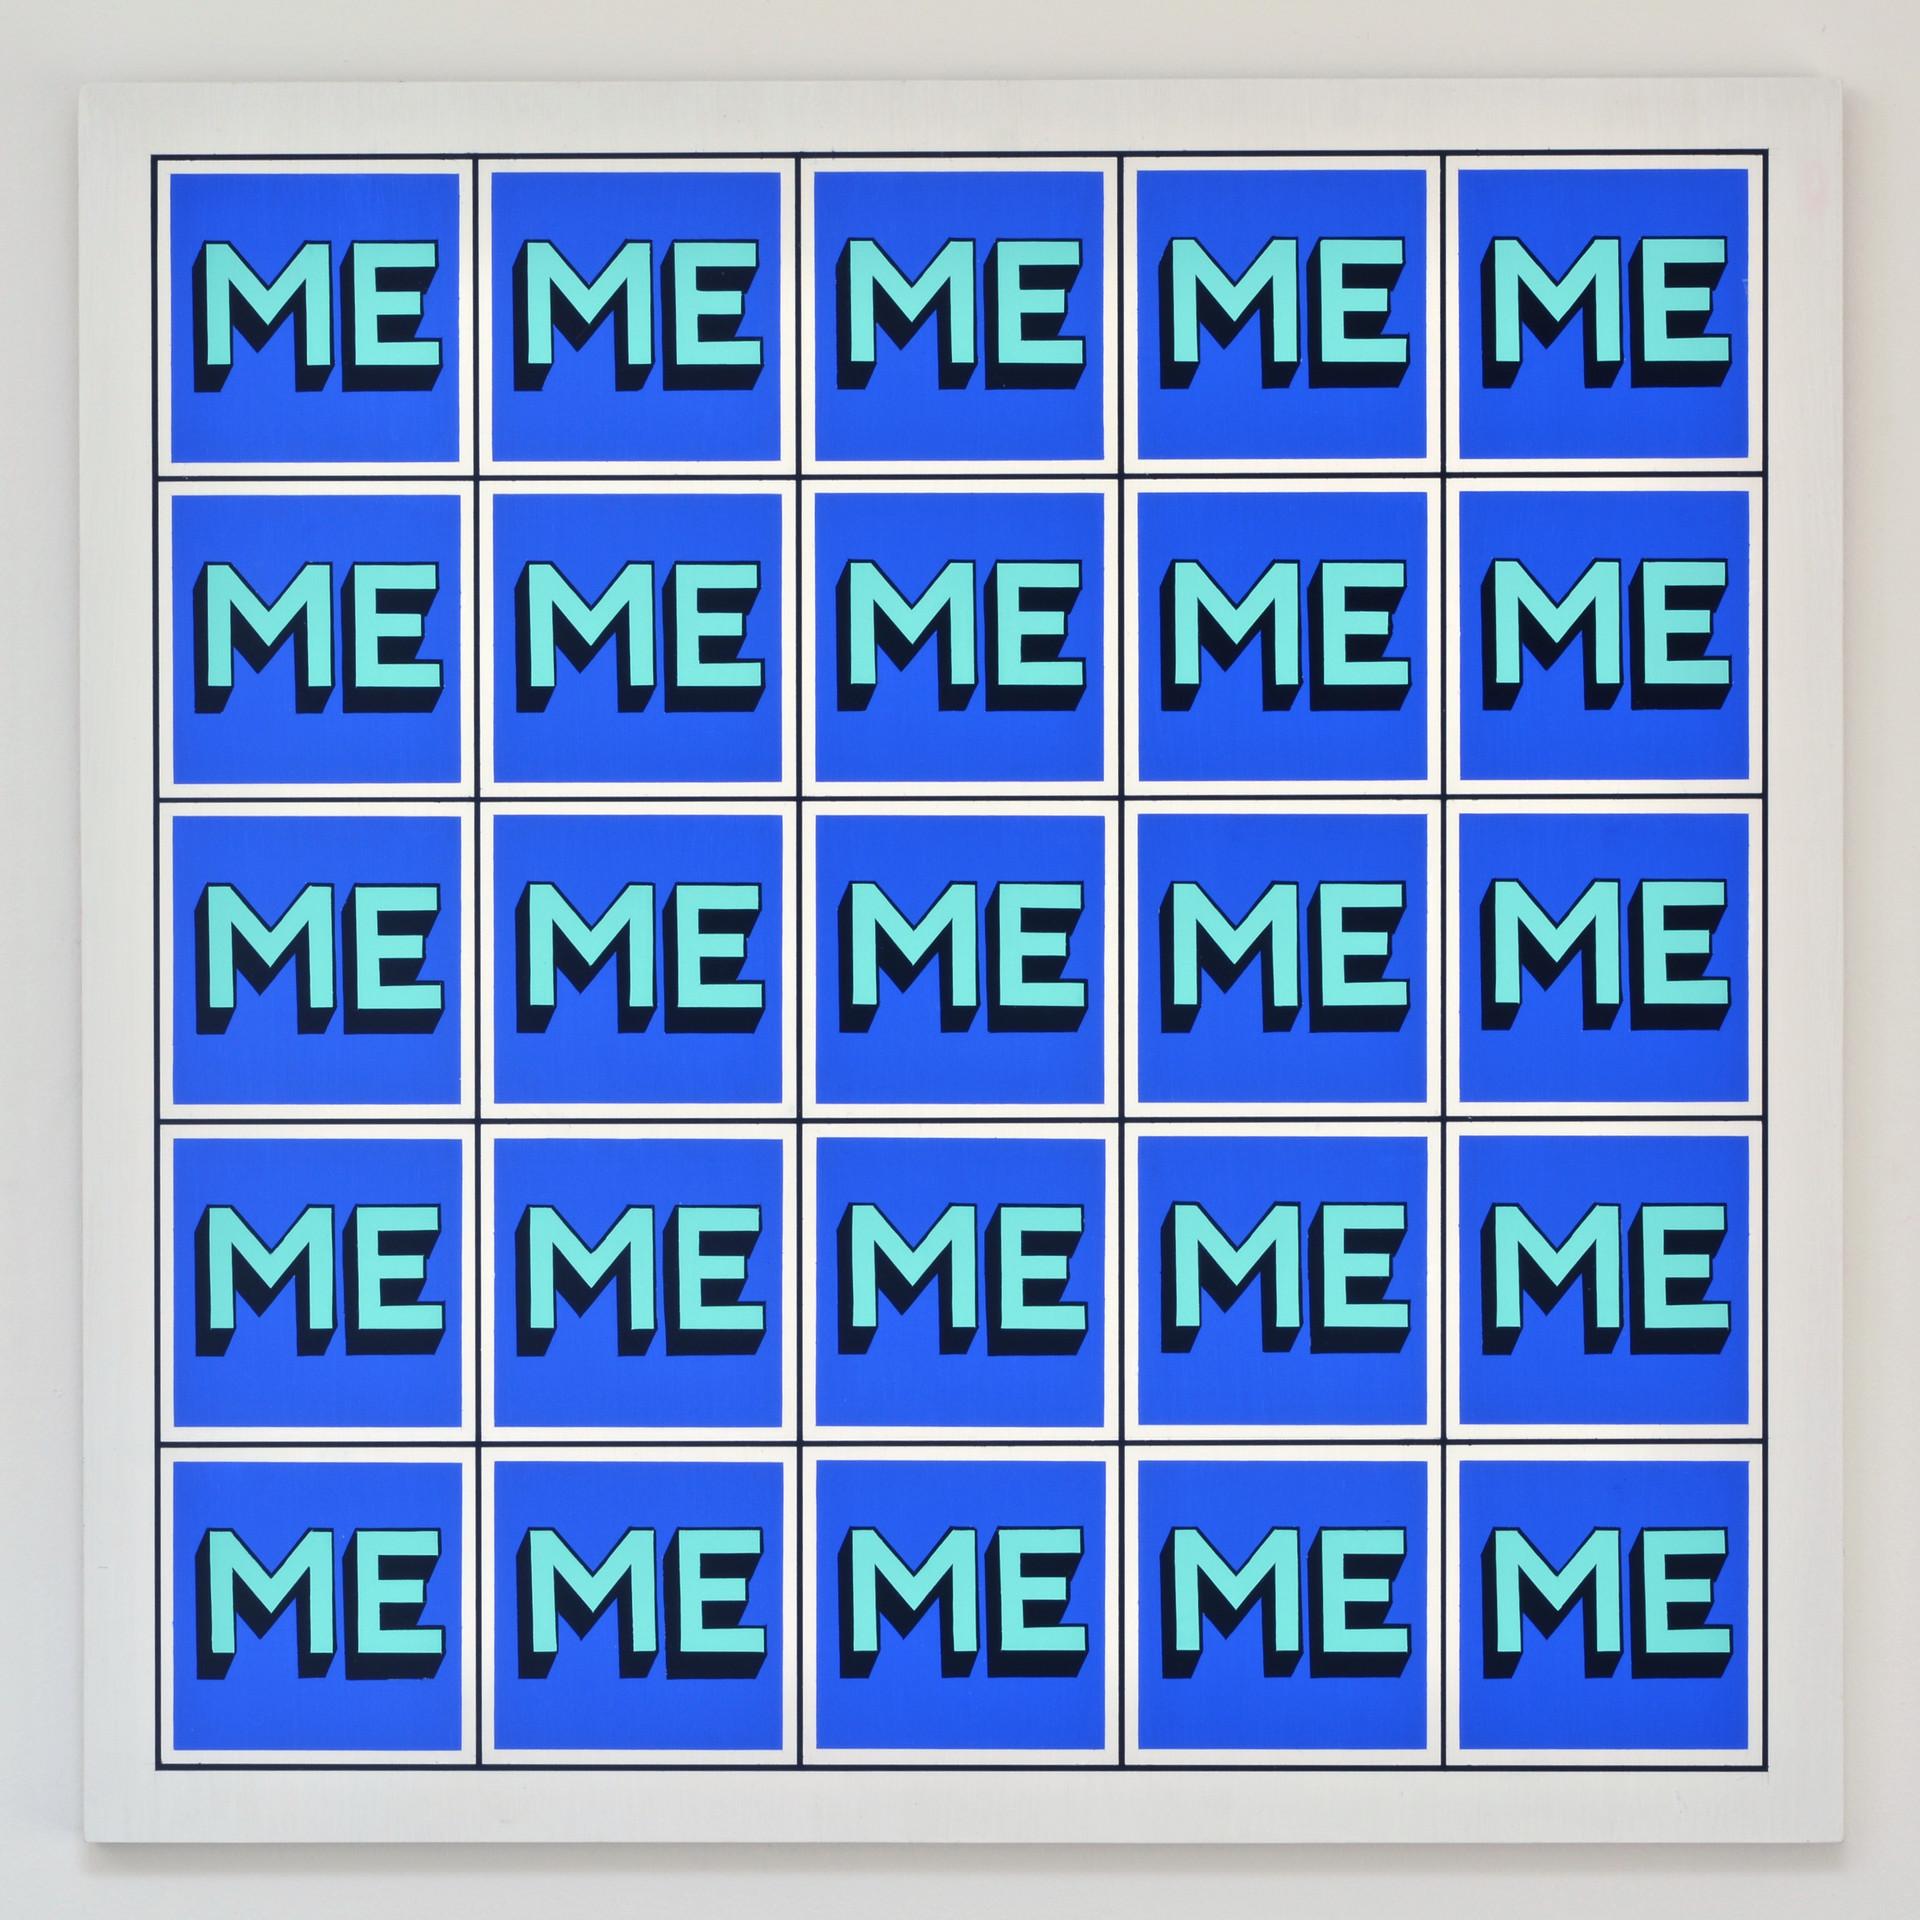 ME_023.jpg